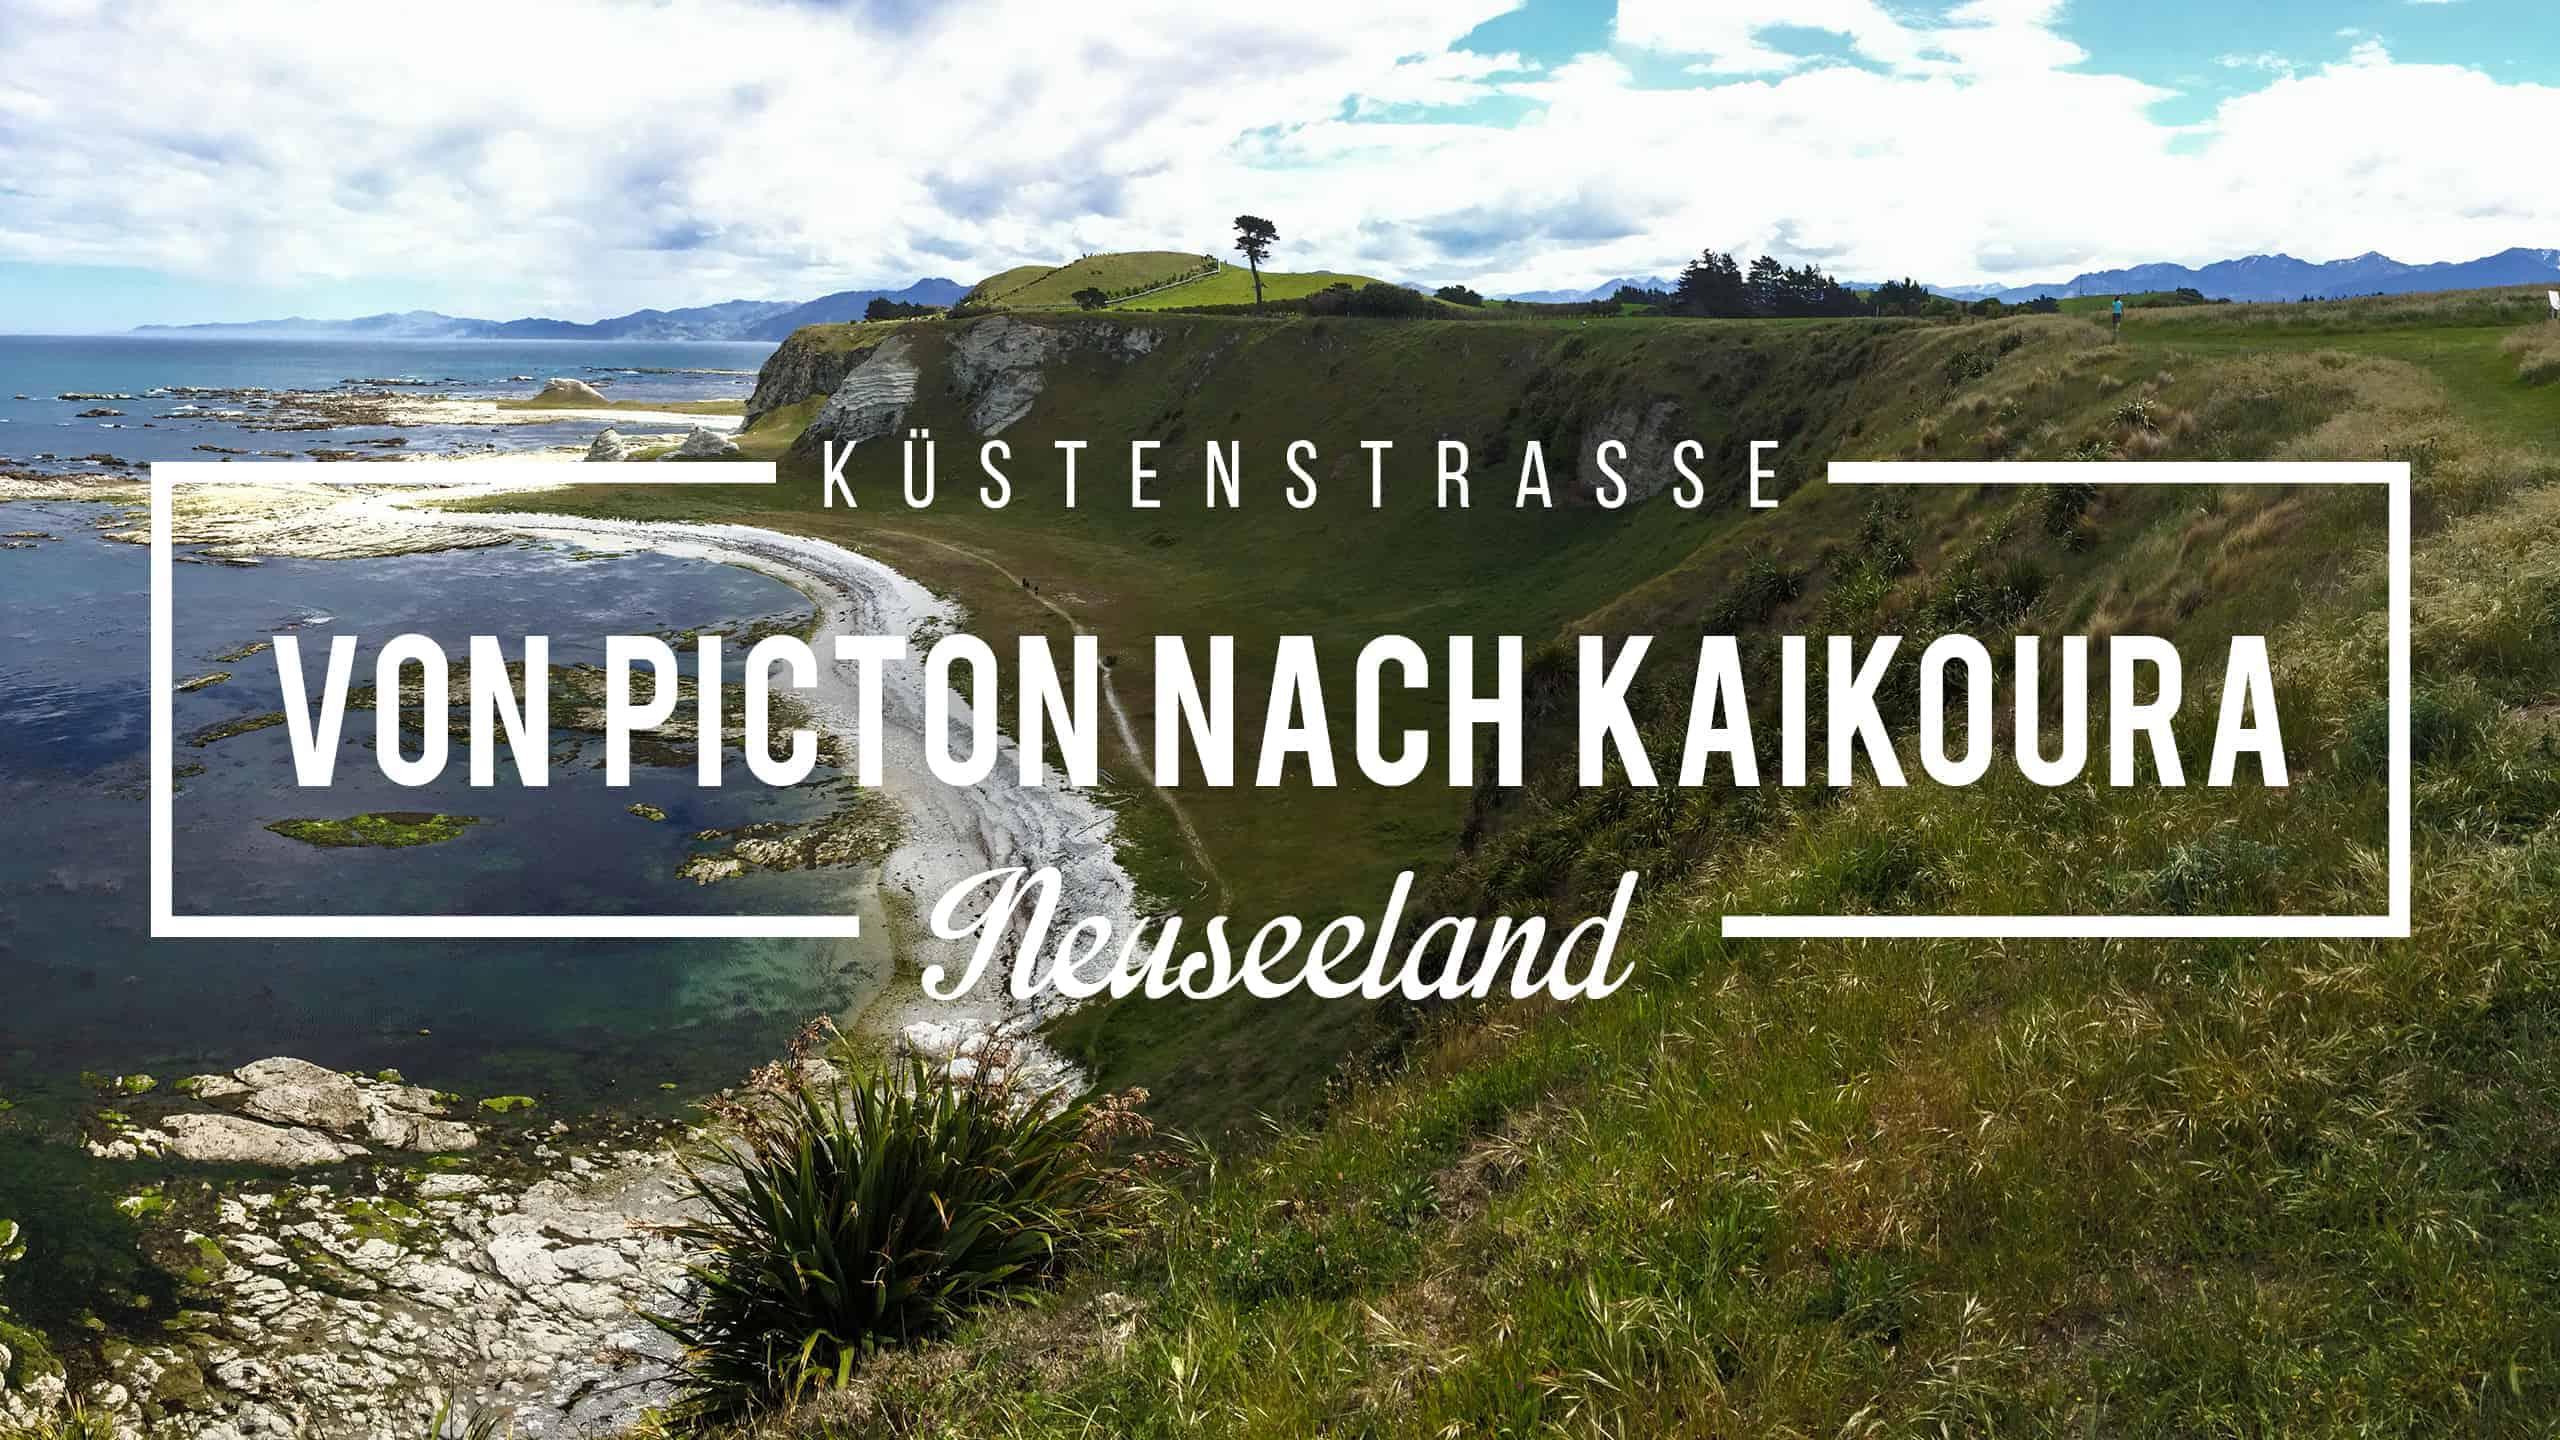 neuseeland-blenheim-kaikoura